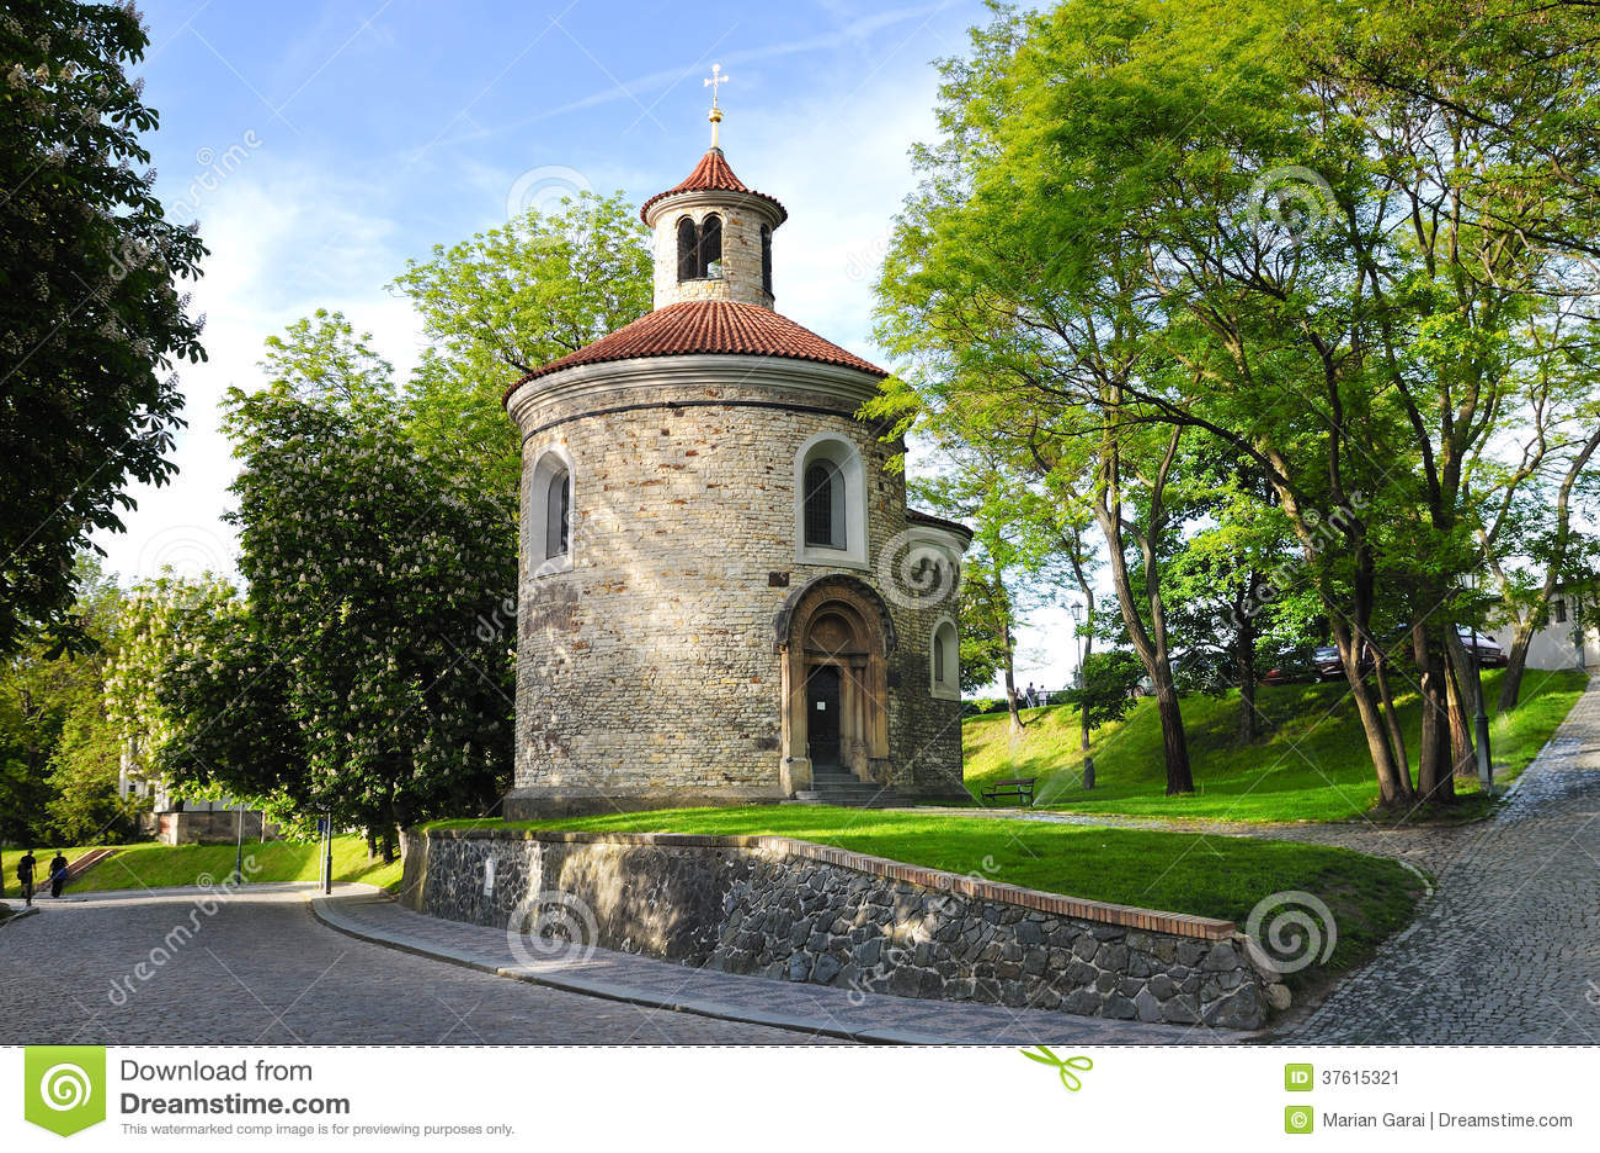 St. Martin Rotunda in Vysehrad